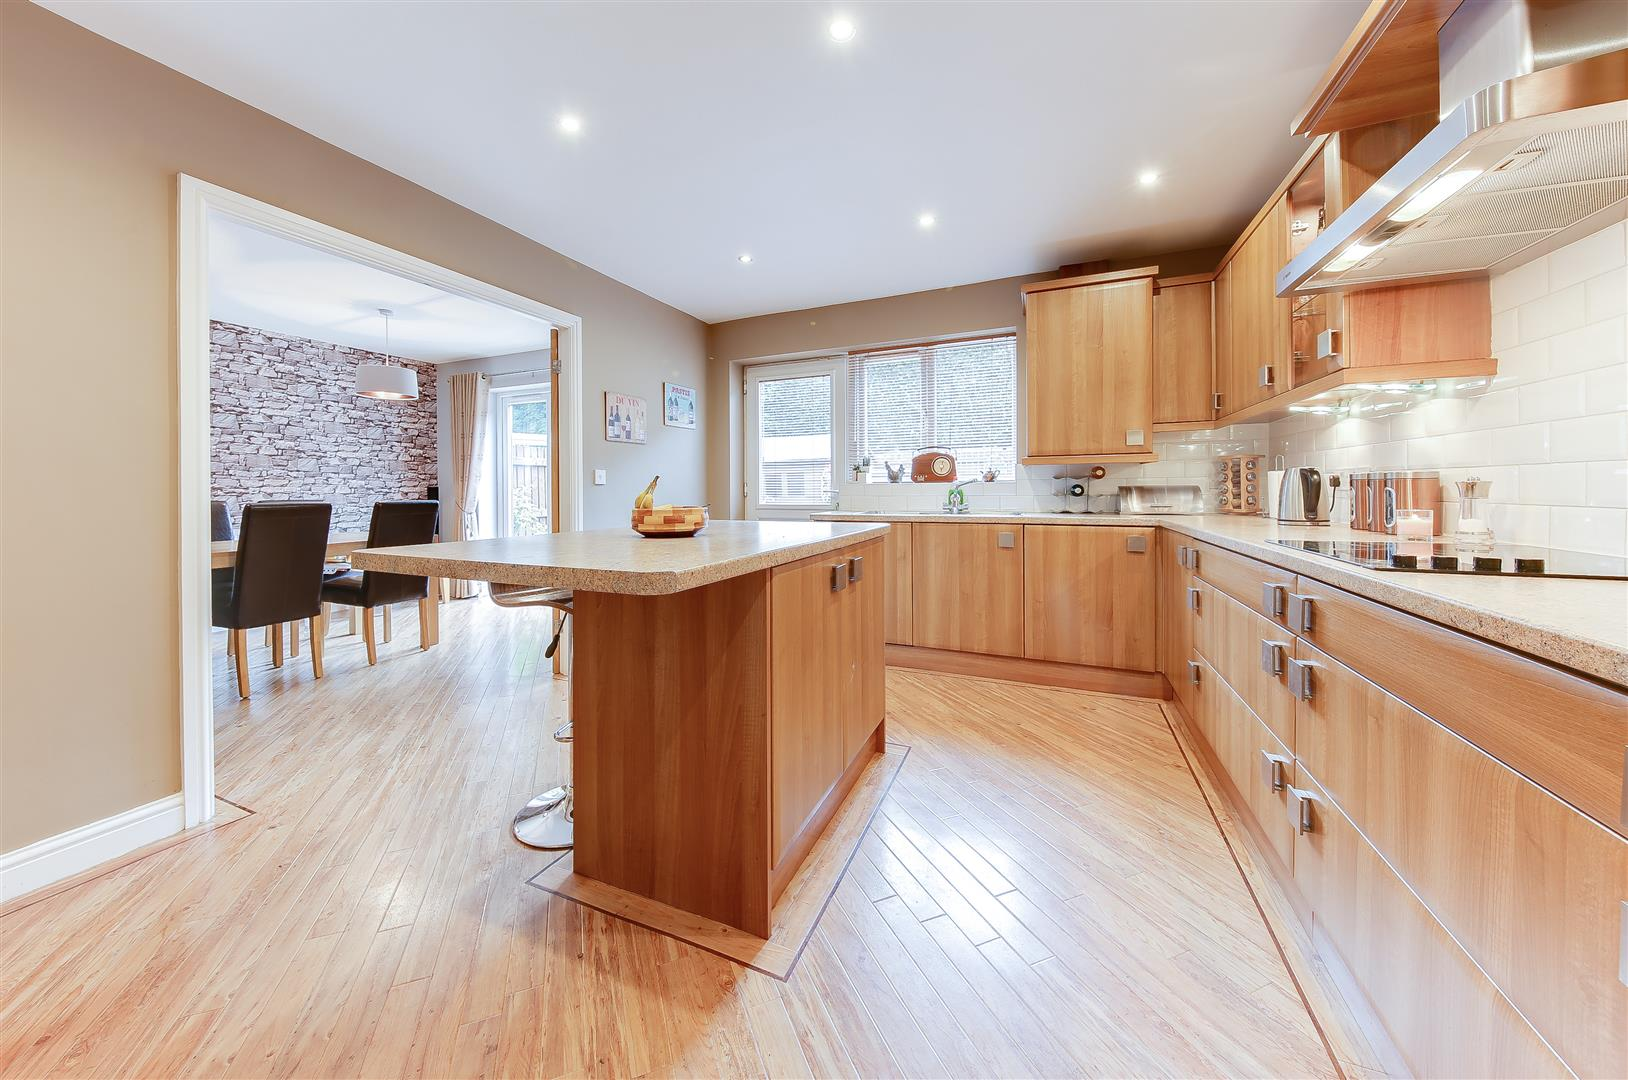 4 Bedrooms Property for sale in Victoria Court, Haslingden, Rossendale